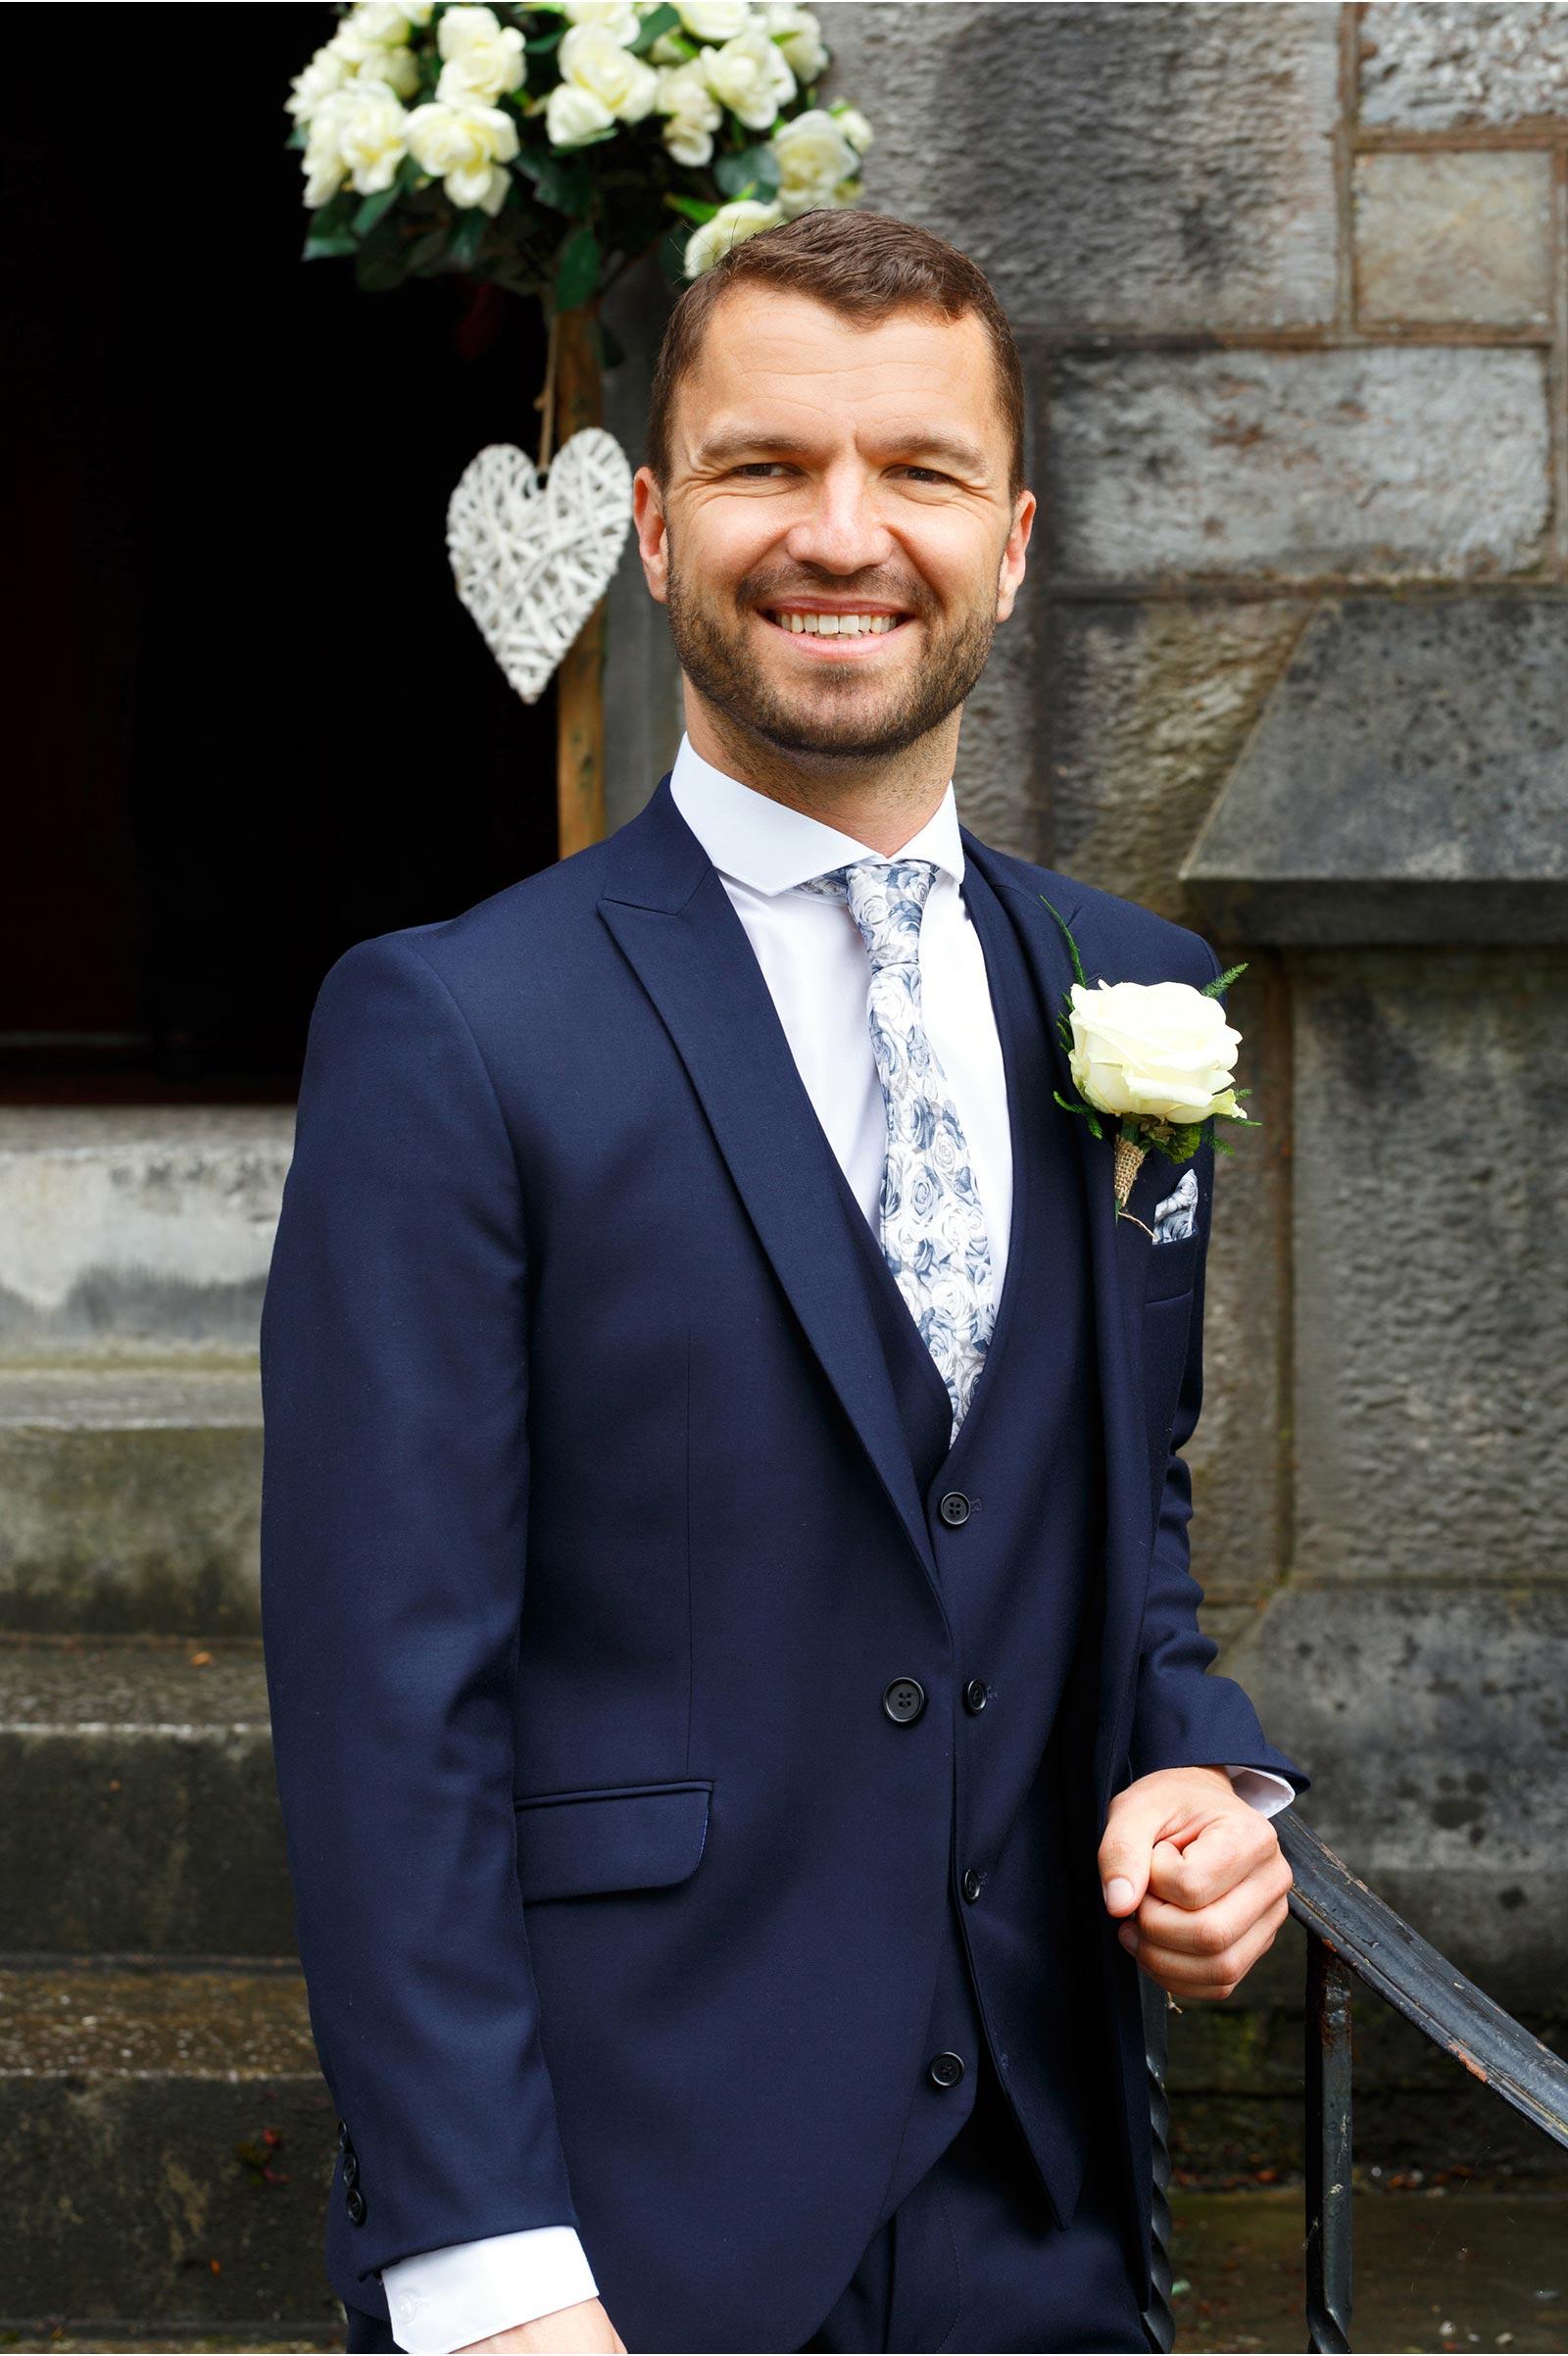 three piece suit on groom at the Aula Maxima UCC wedding